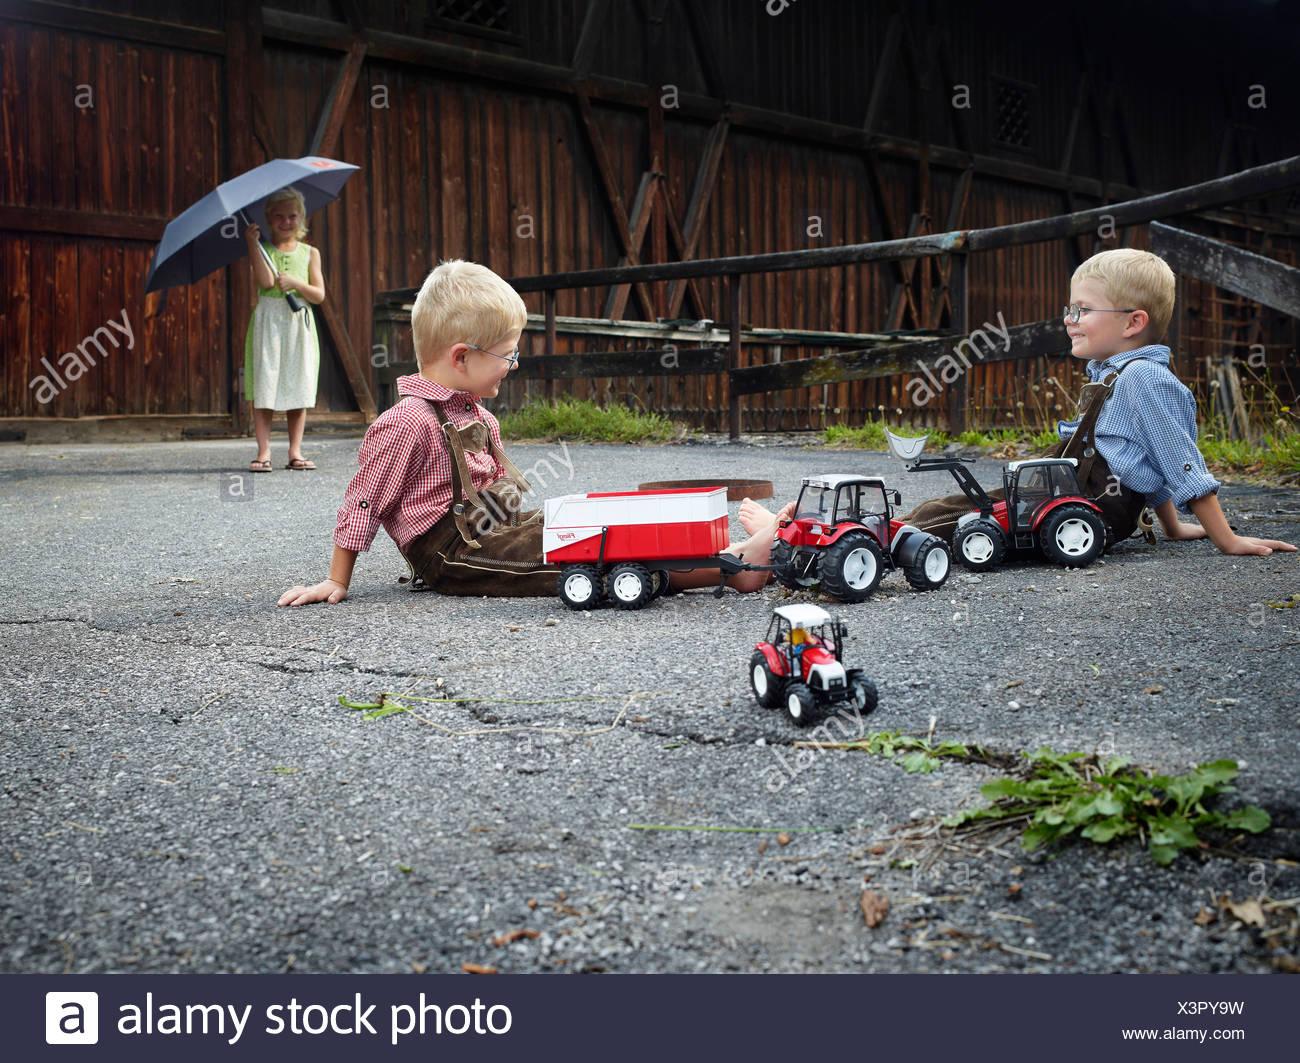 Children playing with toy tractors on farm, Reith im Alpbachtal, Kufstein District, North Tirol, Tirol, Austria - Stock Image